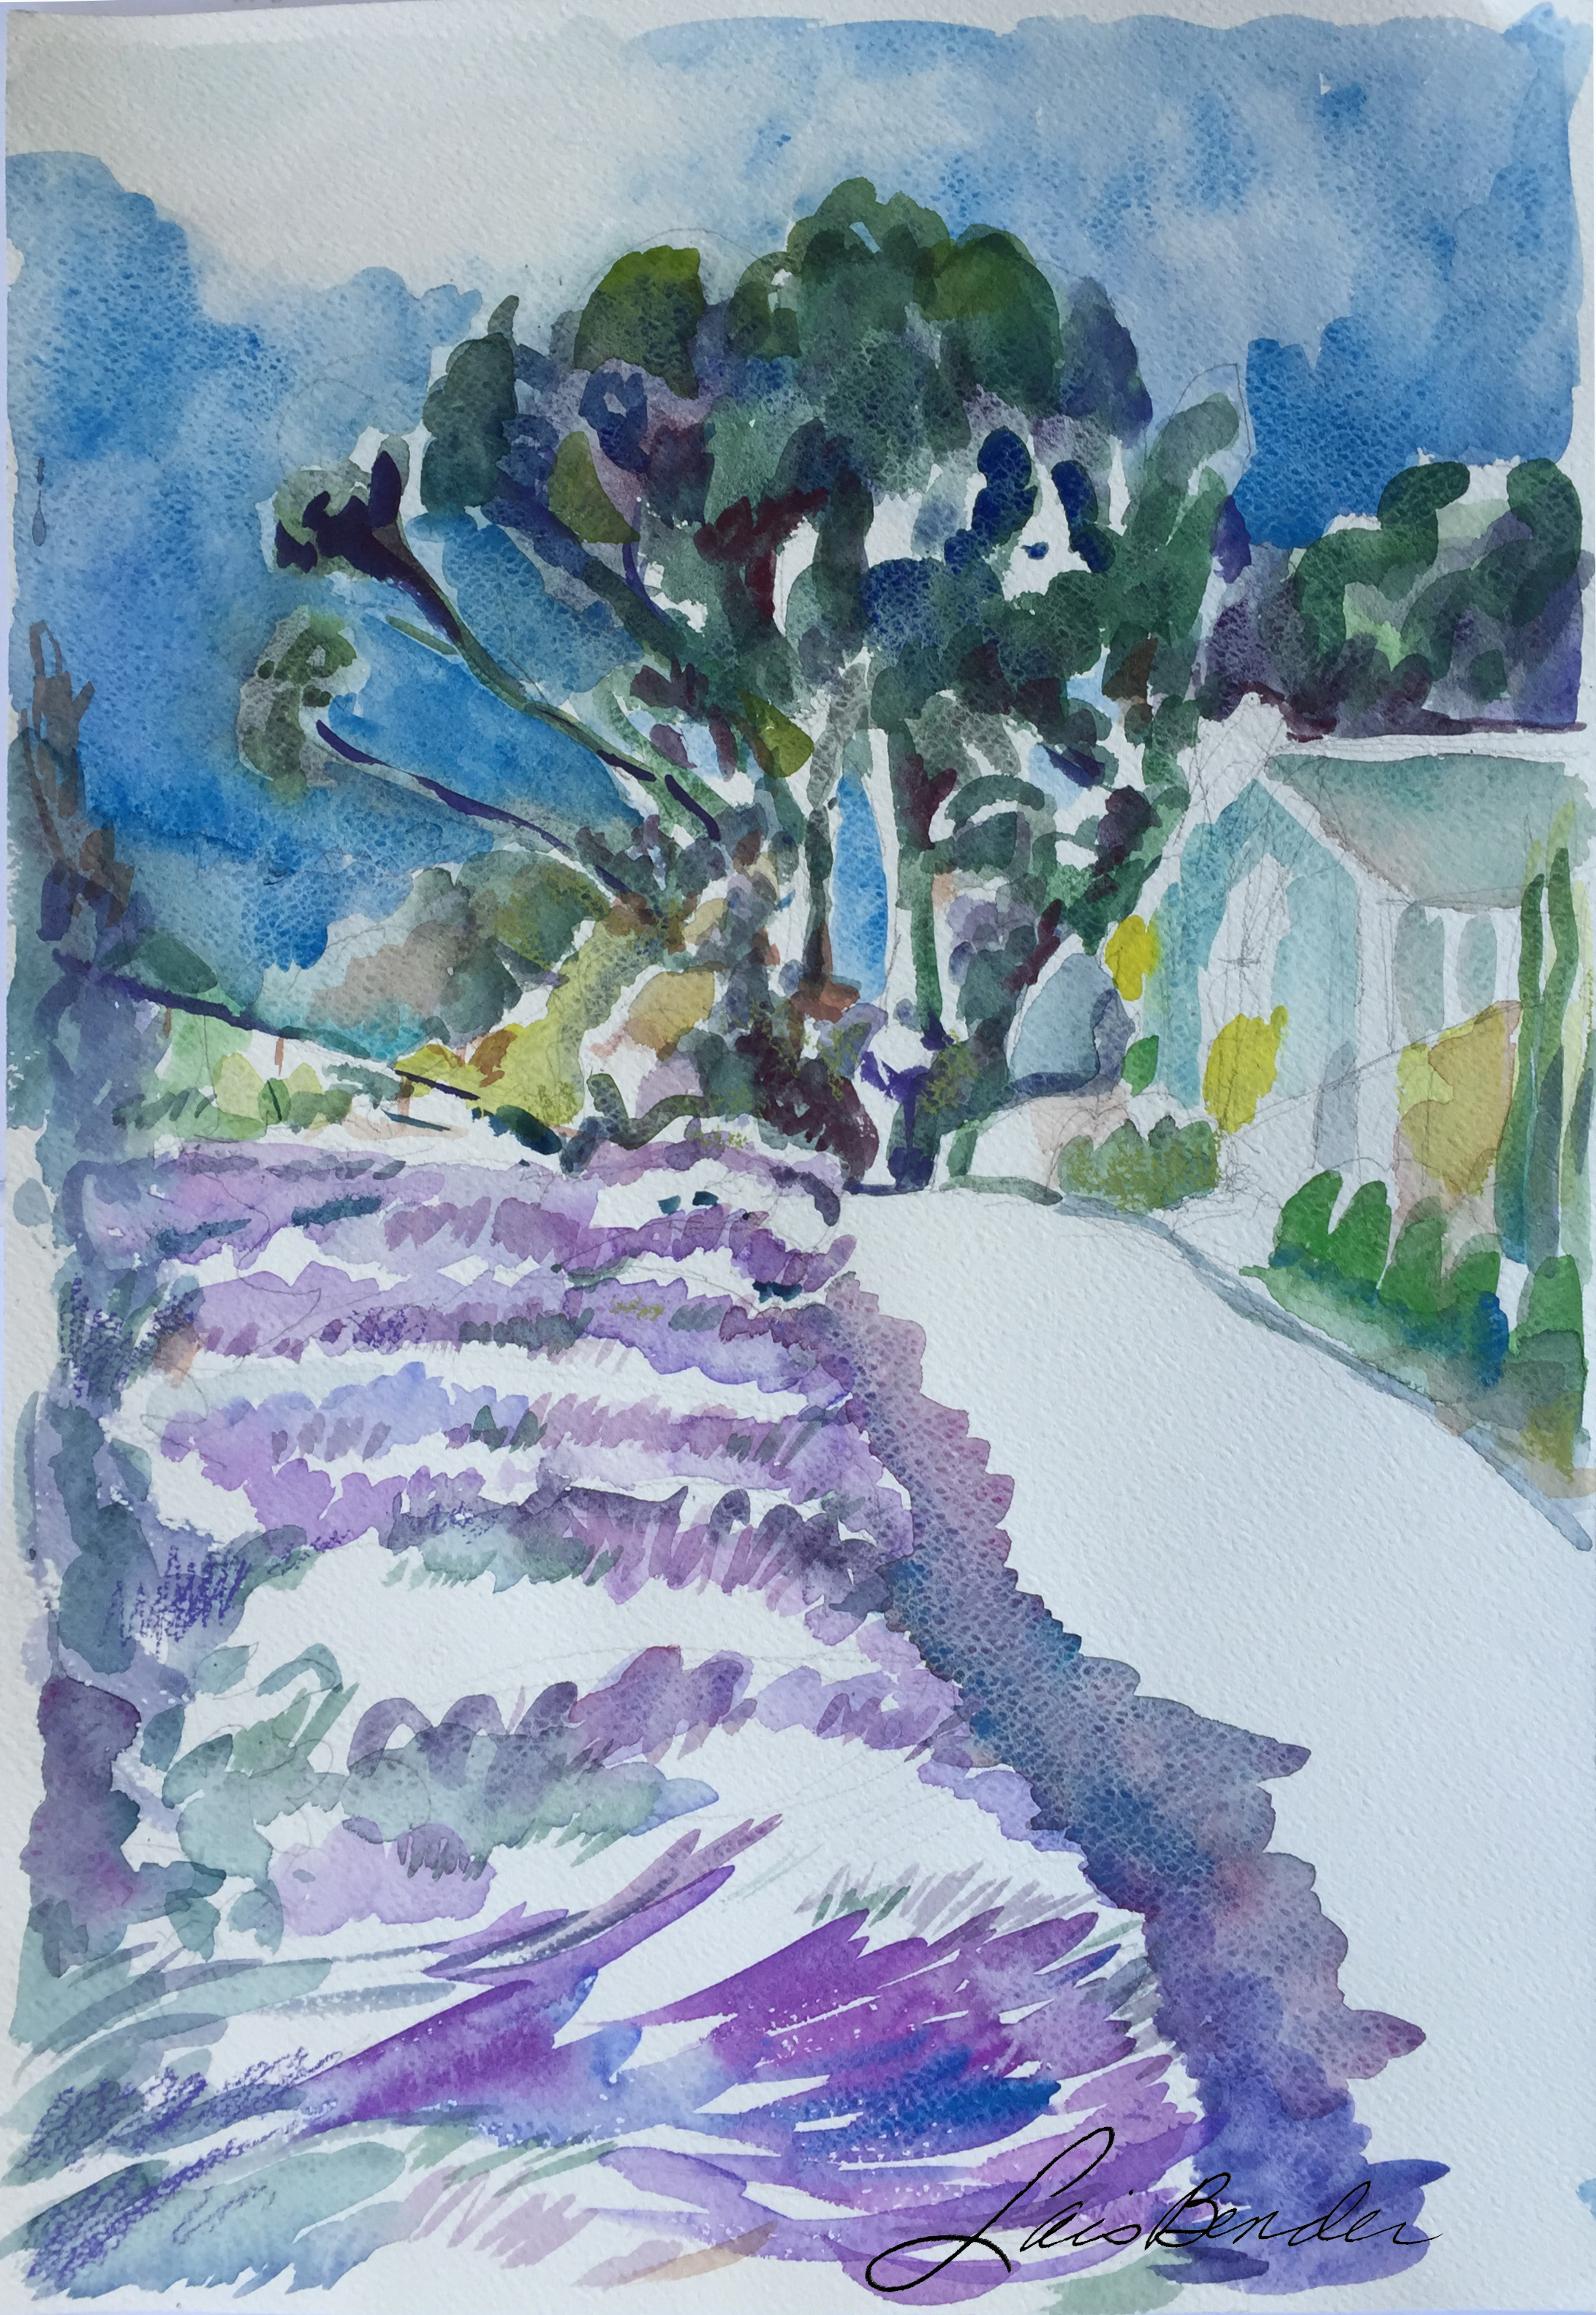 Lavender-Bender-1975.JPG